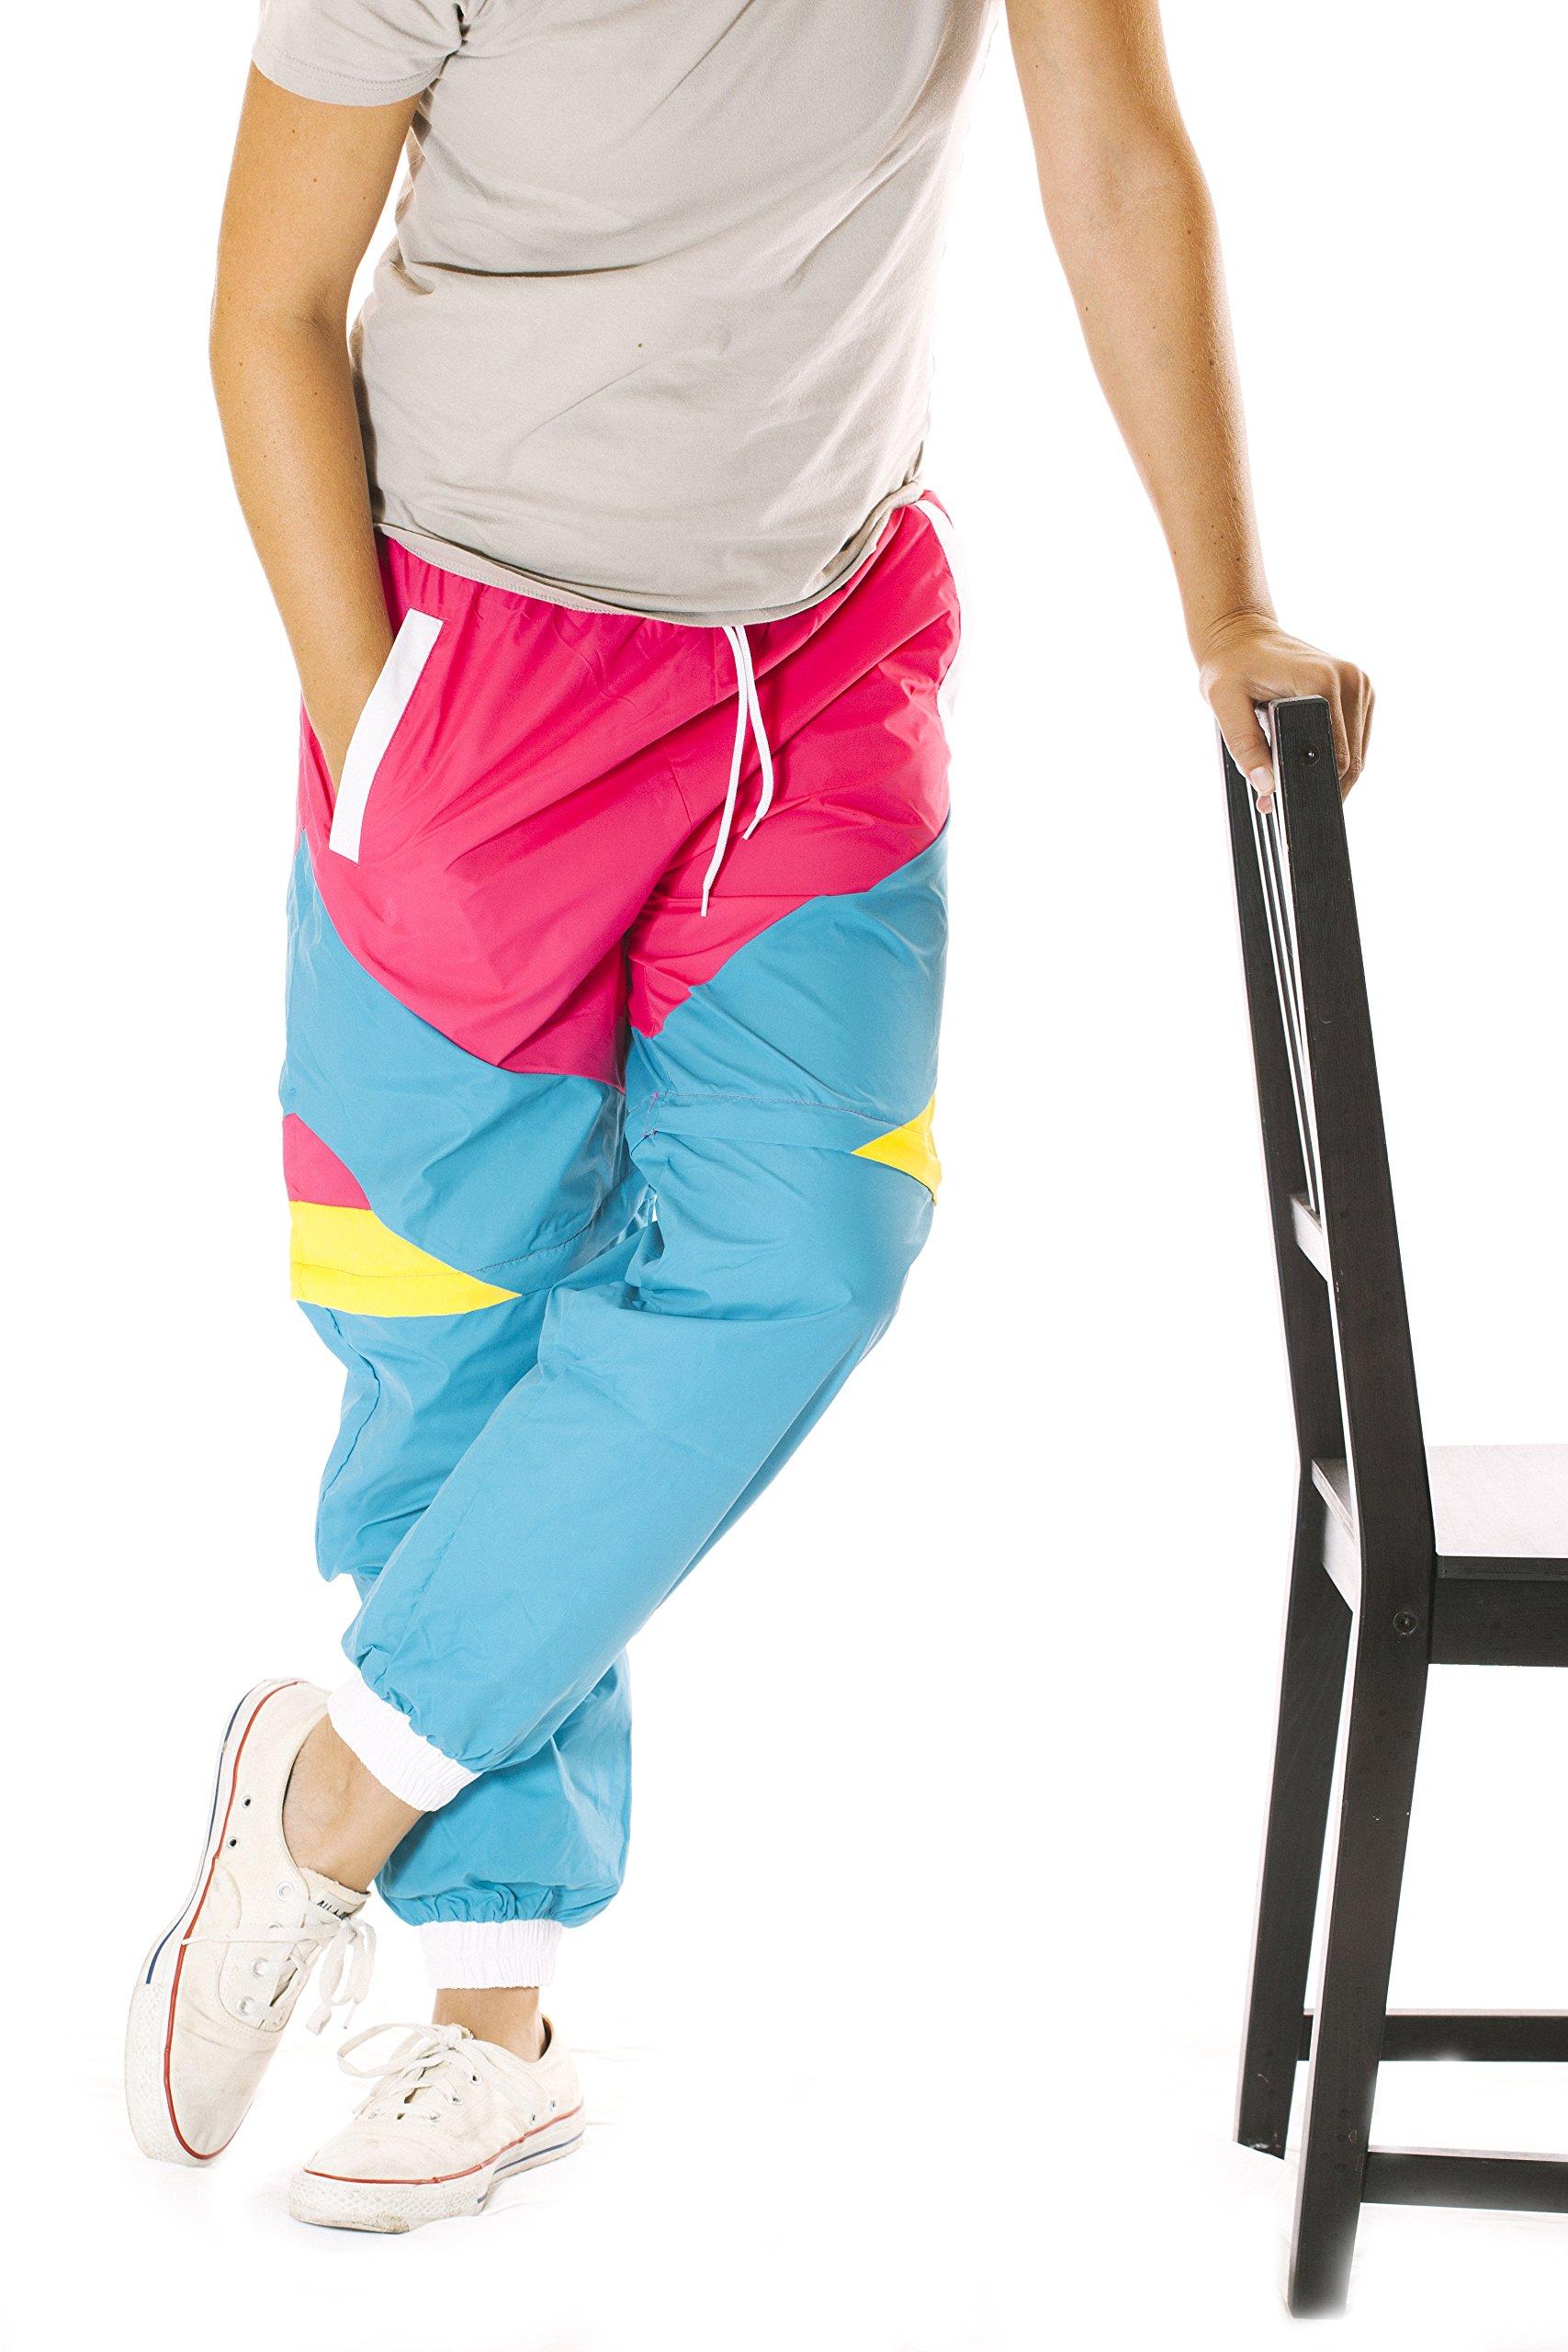 Funny Guy Mugs Like Totally 80s & 90s Retro Neon Windbreaker Pants, X-Large